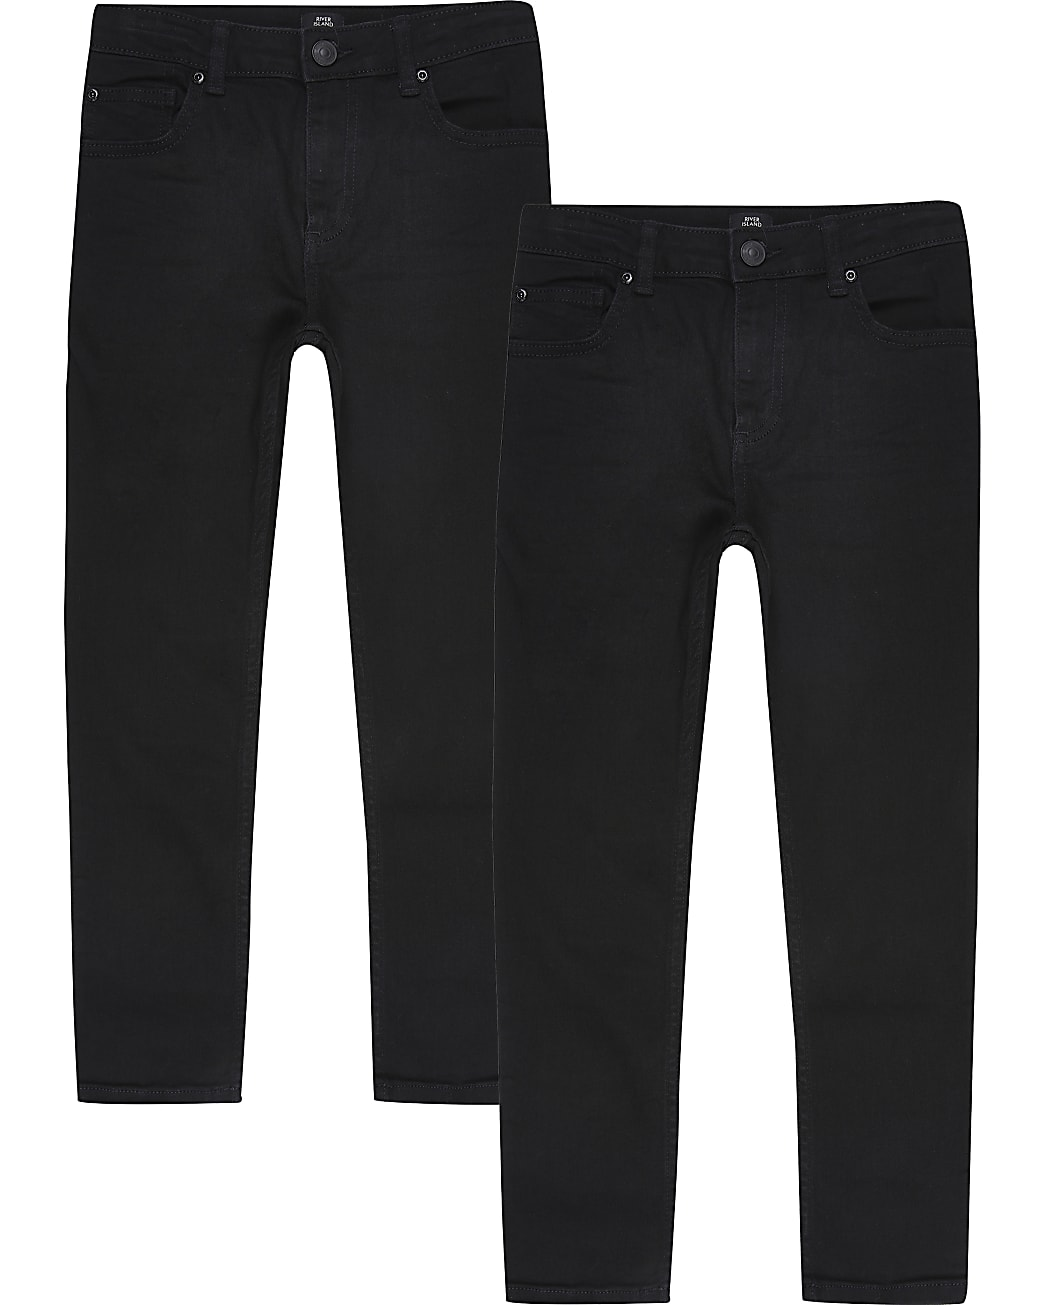 Boys black skinny fit jeans 2 pack